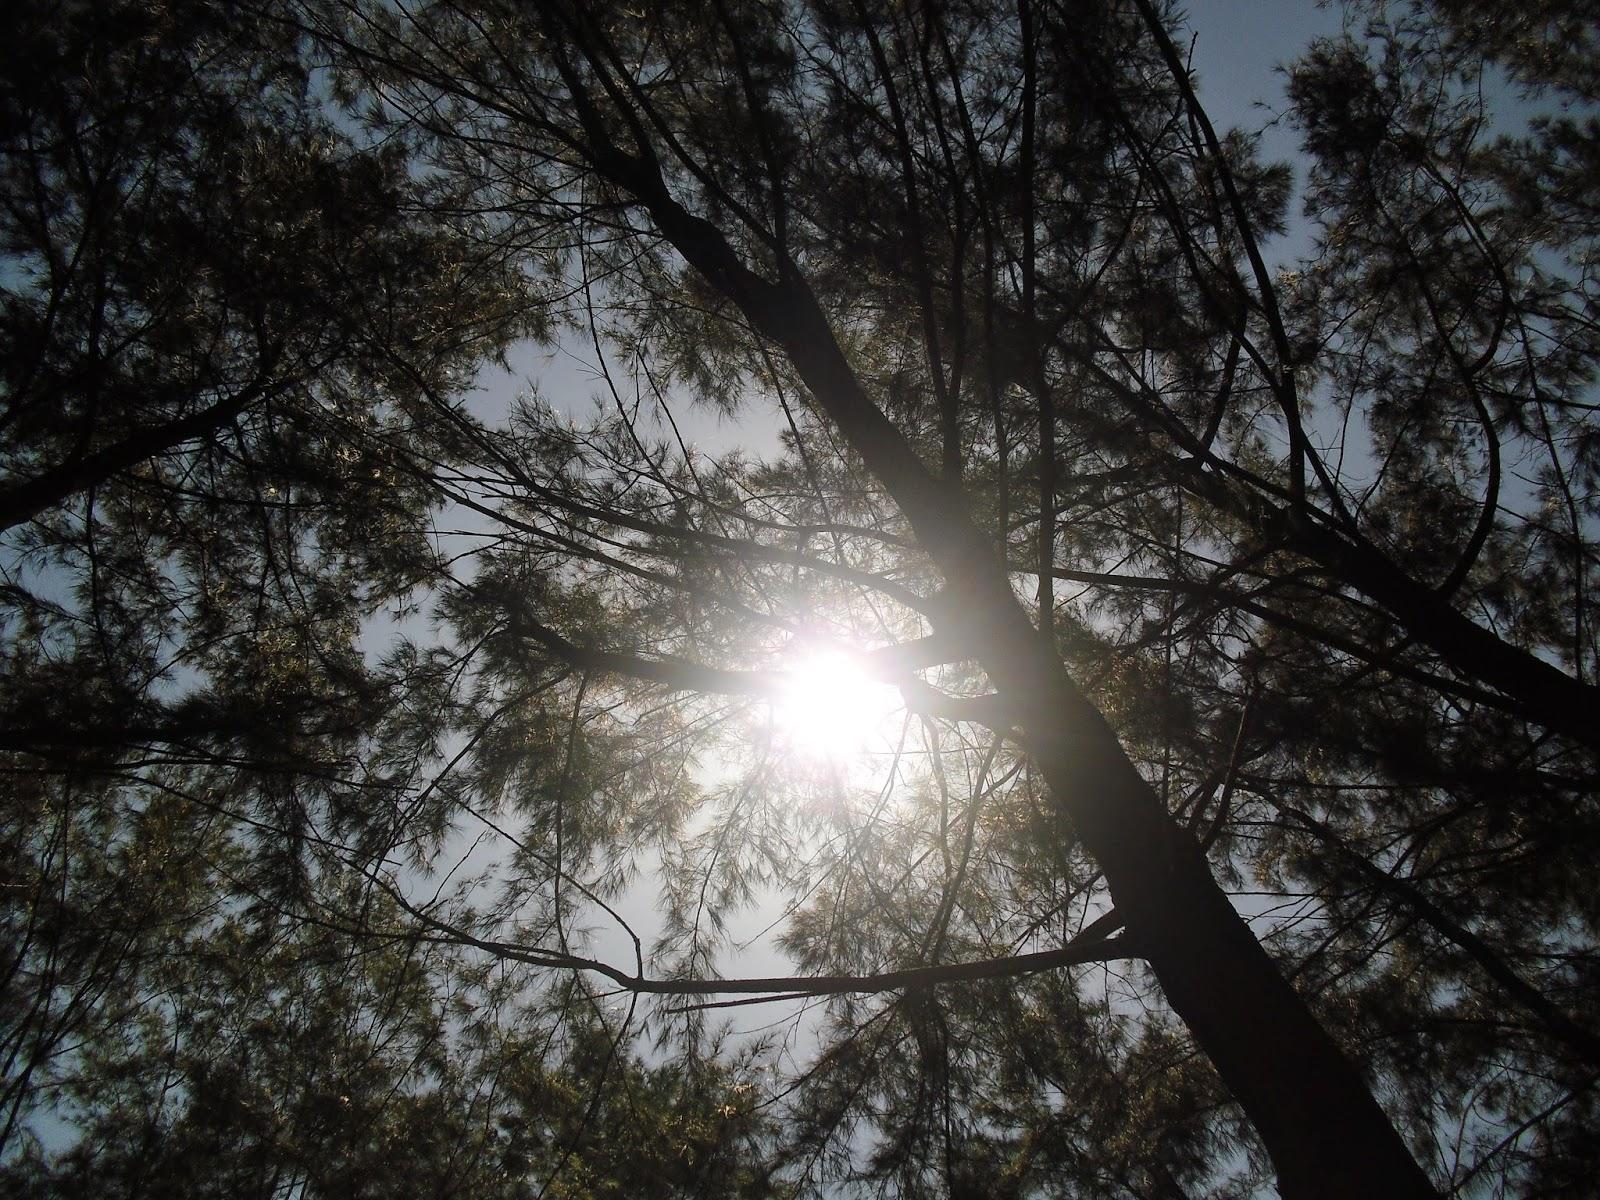 Pine trees at Anawangin